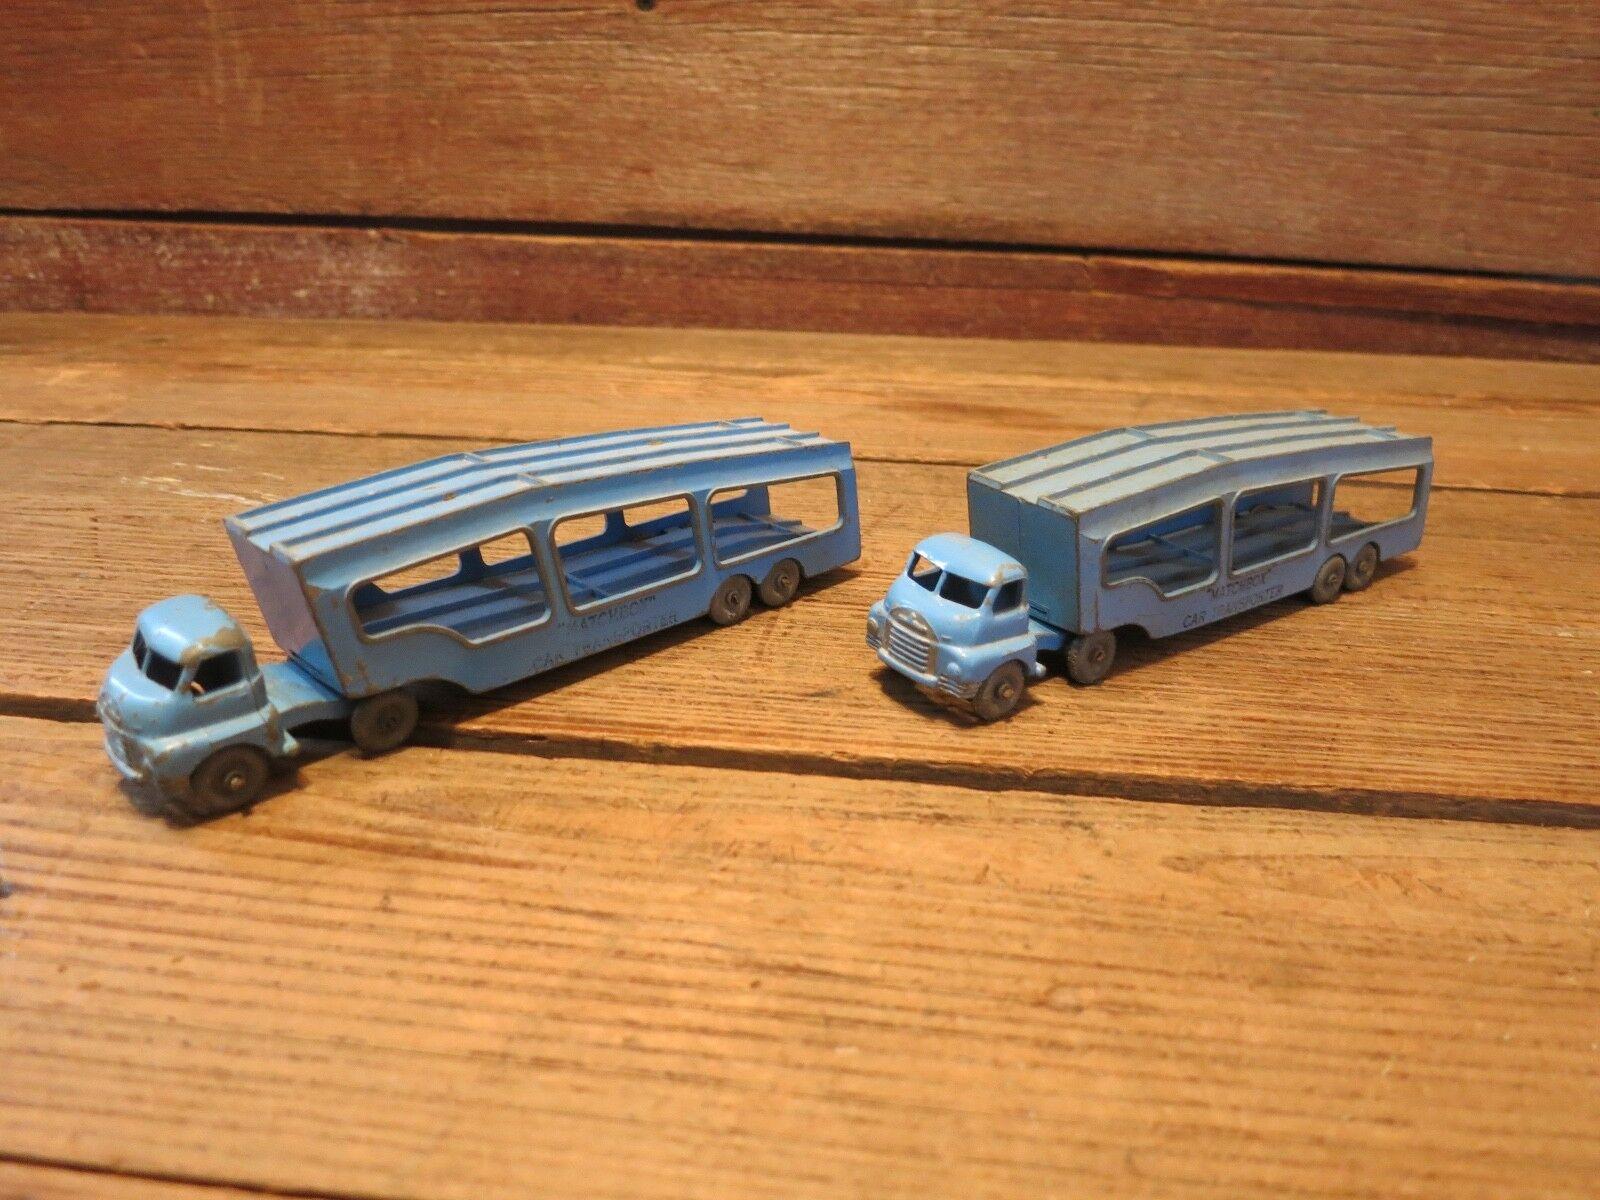 Jahrgang lesney matchbox auto - - - transporter 2 ab4c67